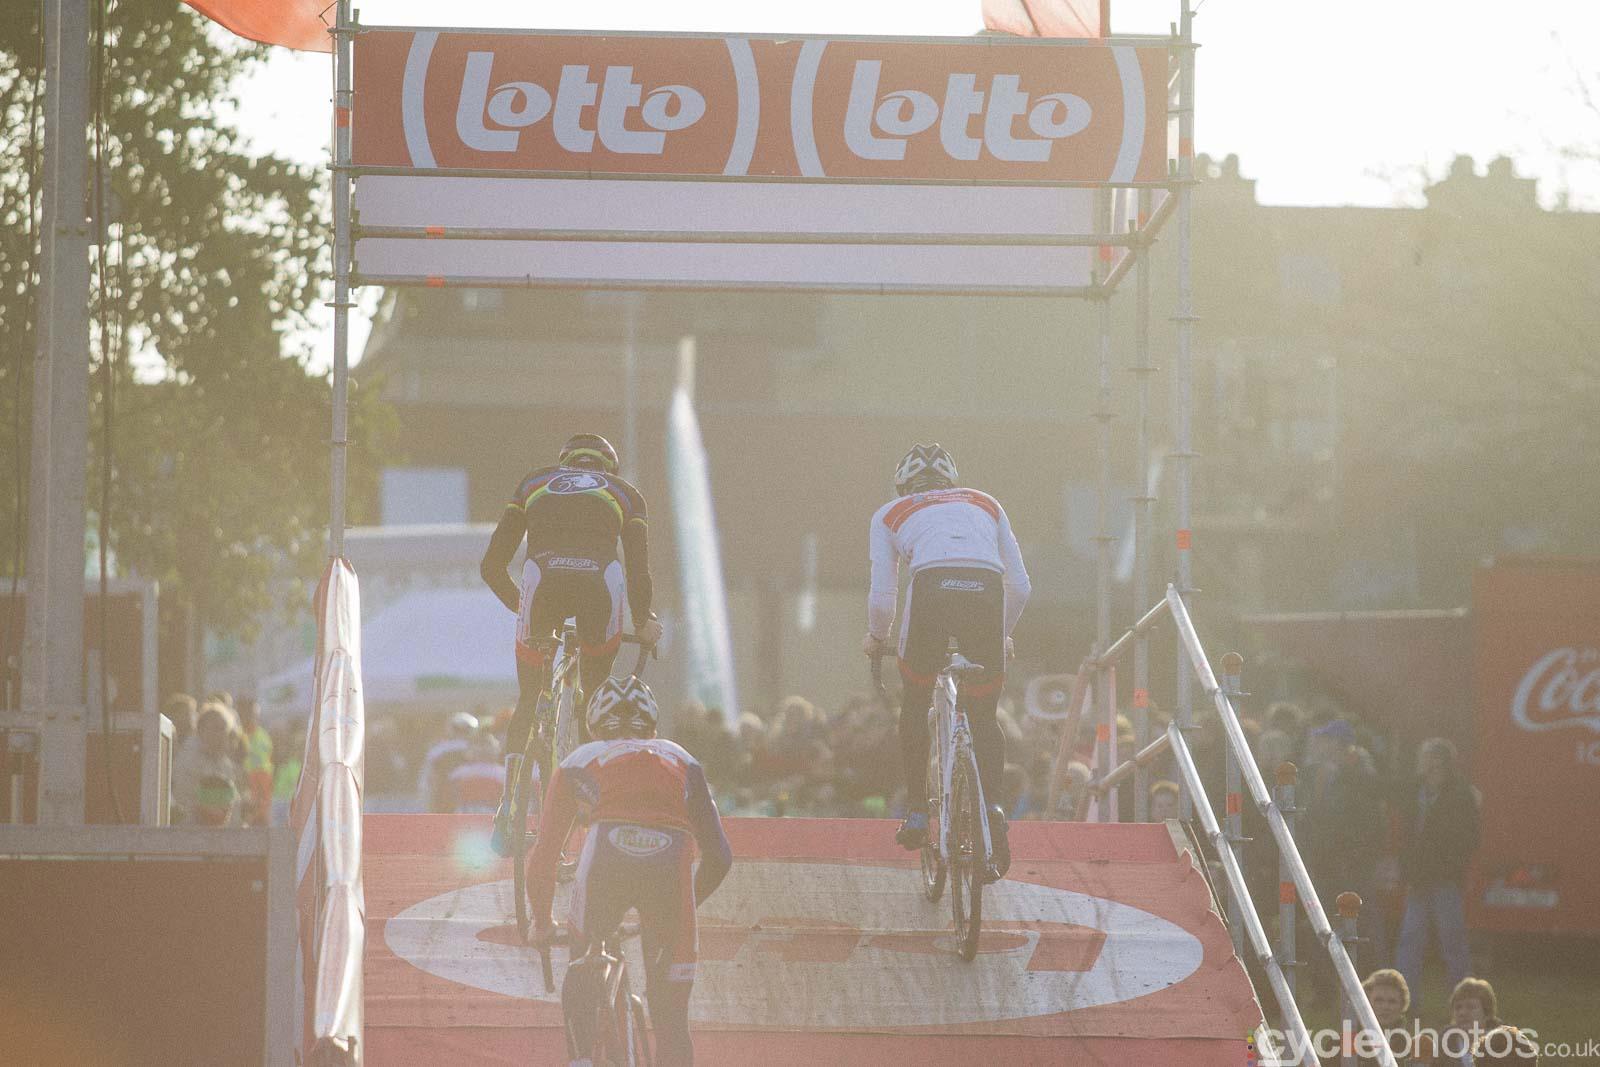 2015-cyclephotos-cyclocross-diegem-150449-course-recce